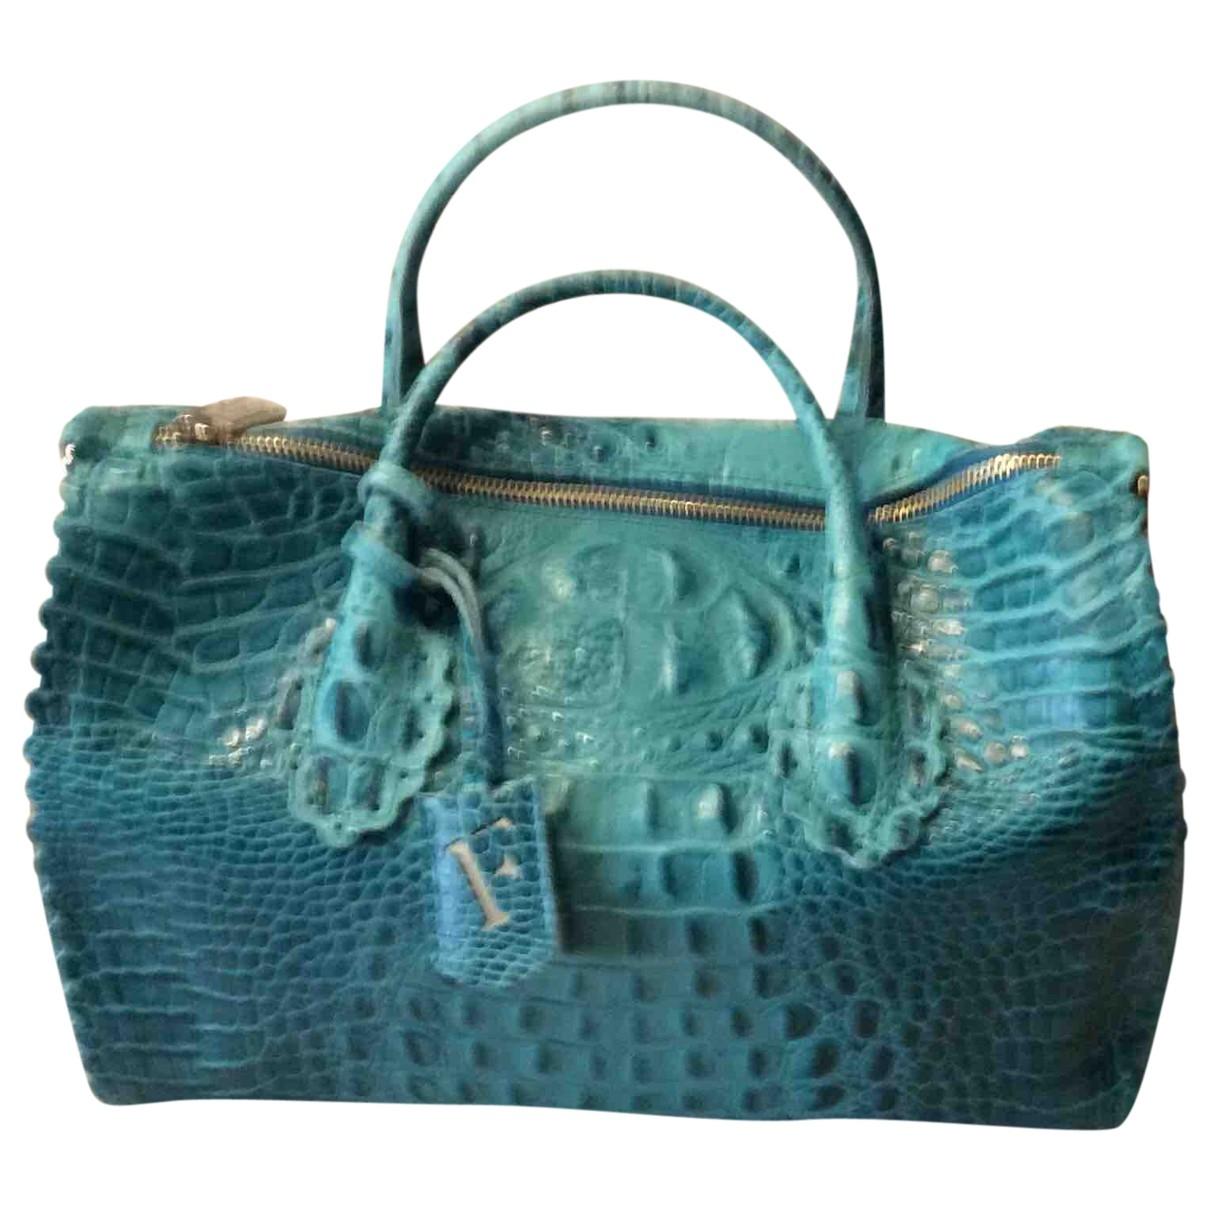 Roberta Furlanetto - Sac a main   pour femme en cuir - turquoise